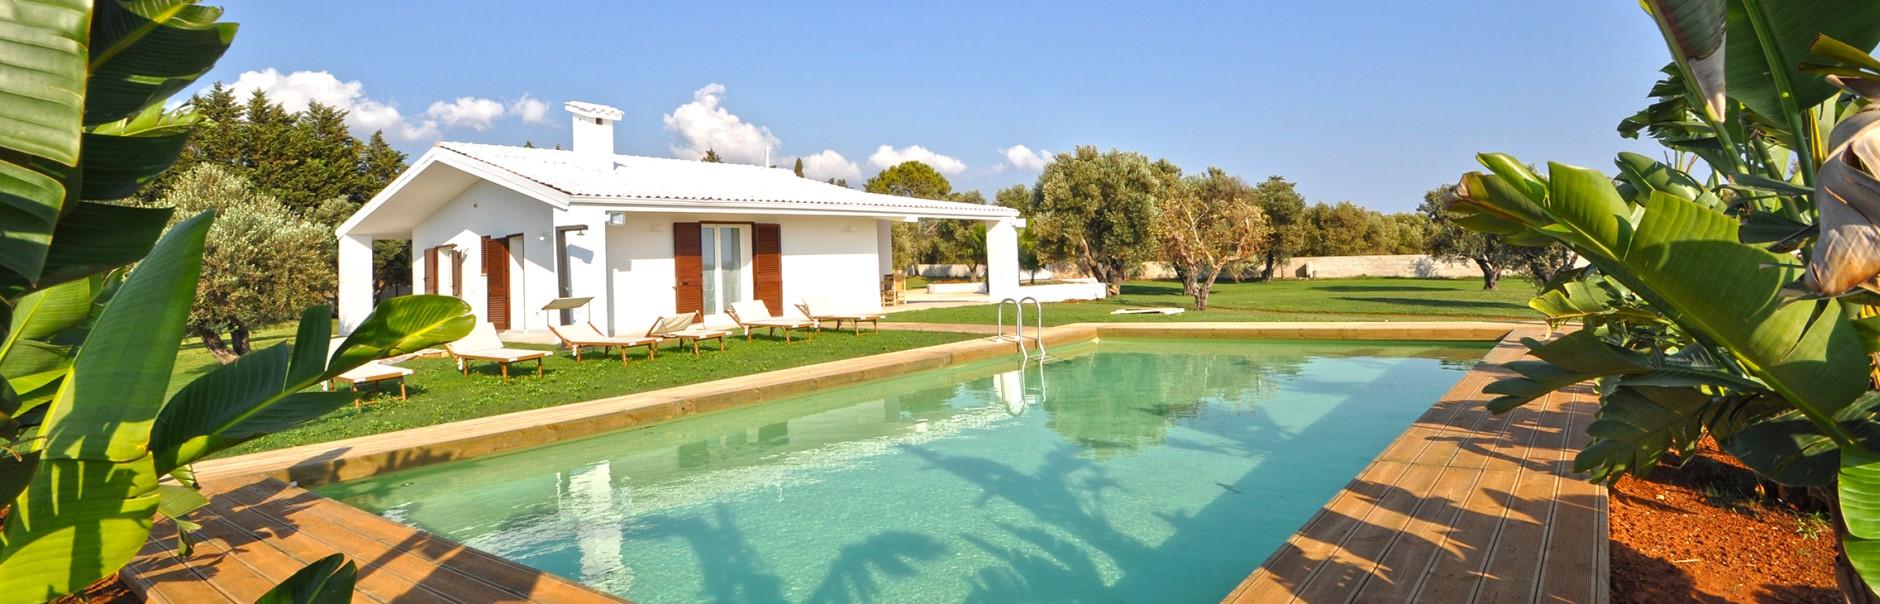 Villa Paradiso - Mancaversa